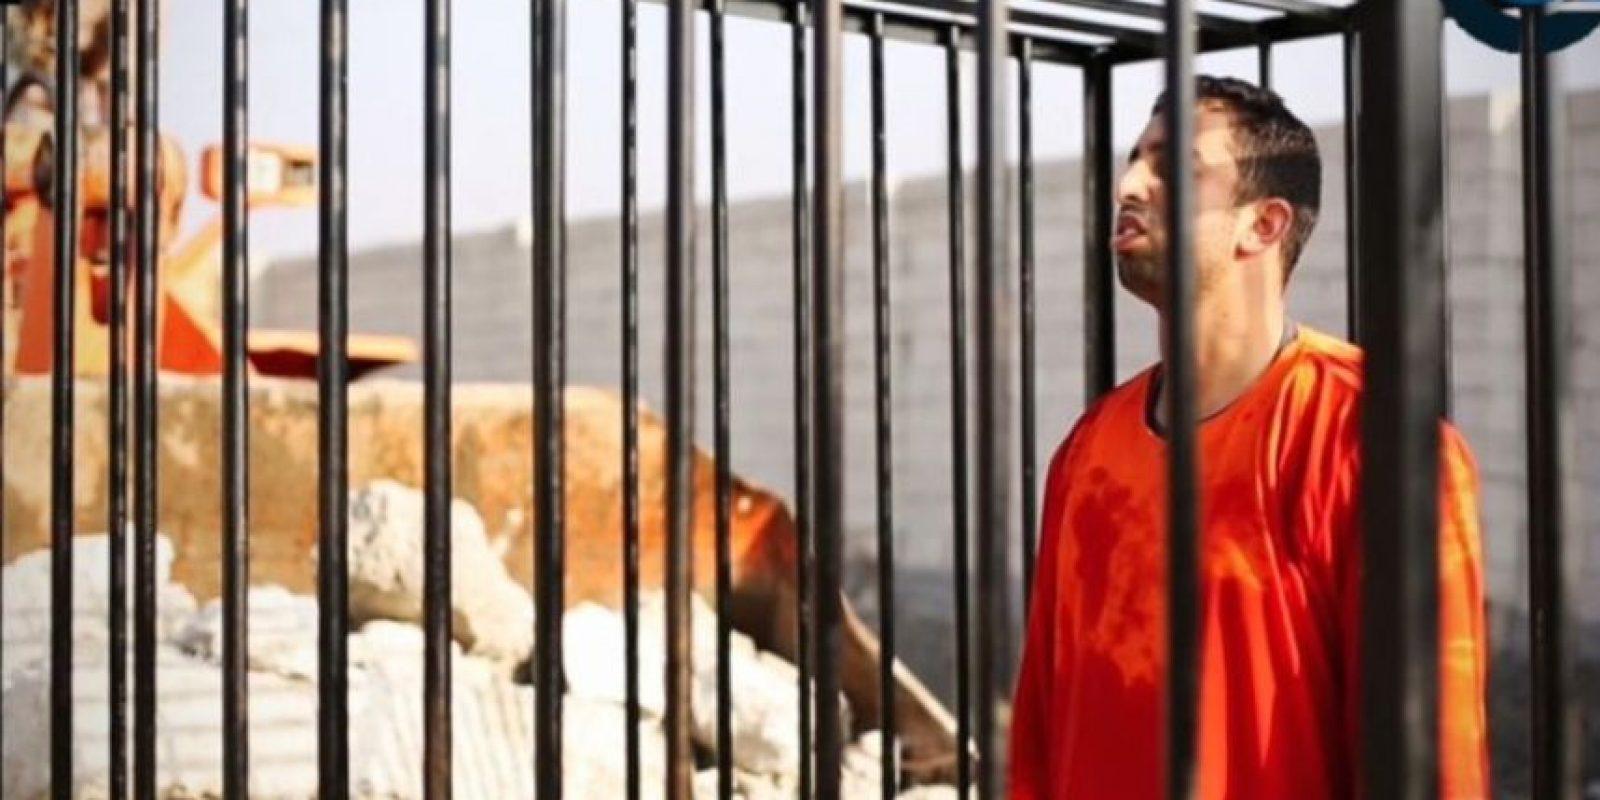 3 de febrero: Estado Islámico quema vivo al piloto jordano Muad al-Kasasbeh Foto:Twitter